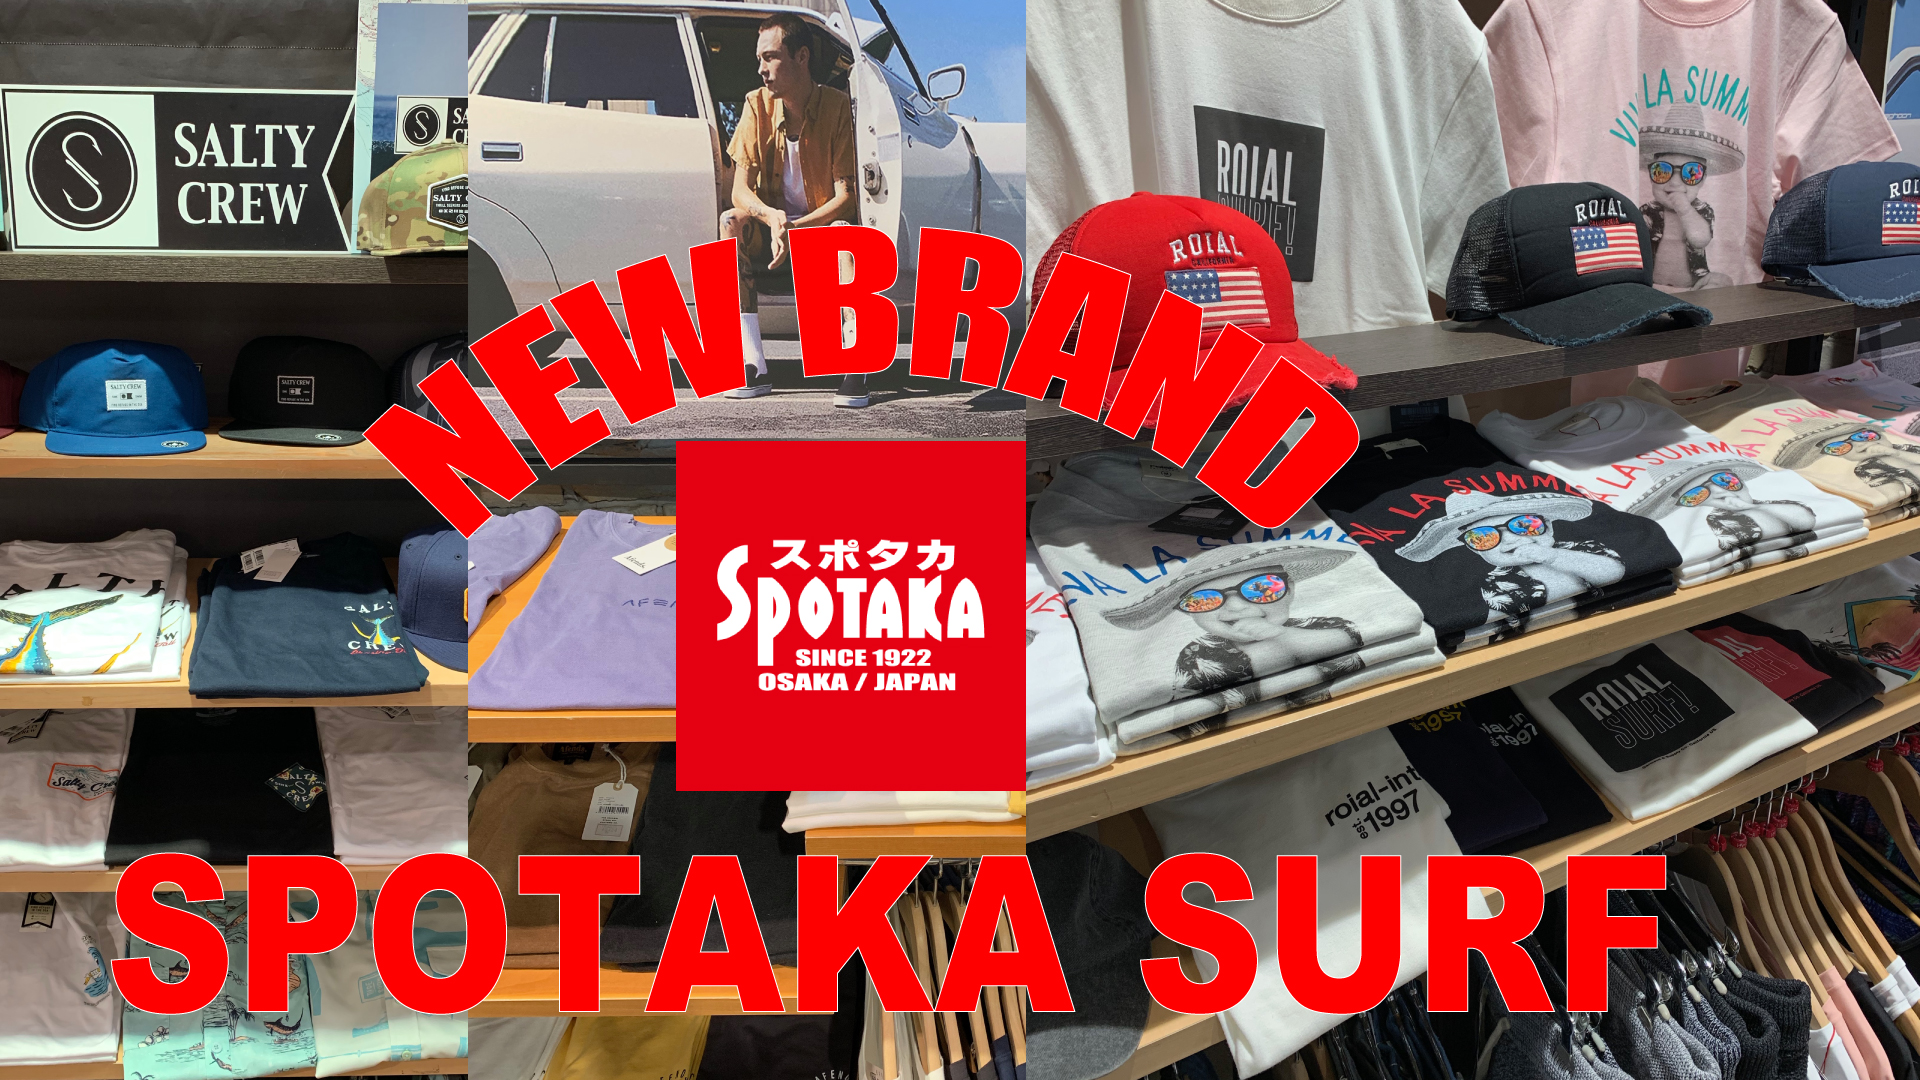 SPOTAKA SURFコーナーに新ブランドが到着しました!